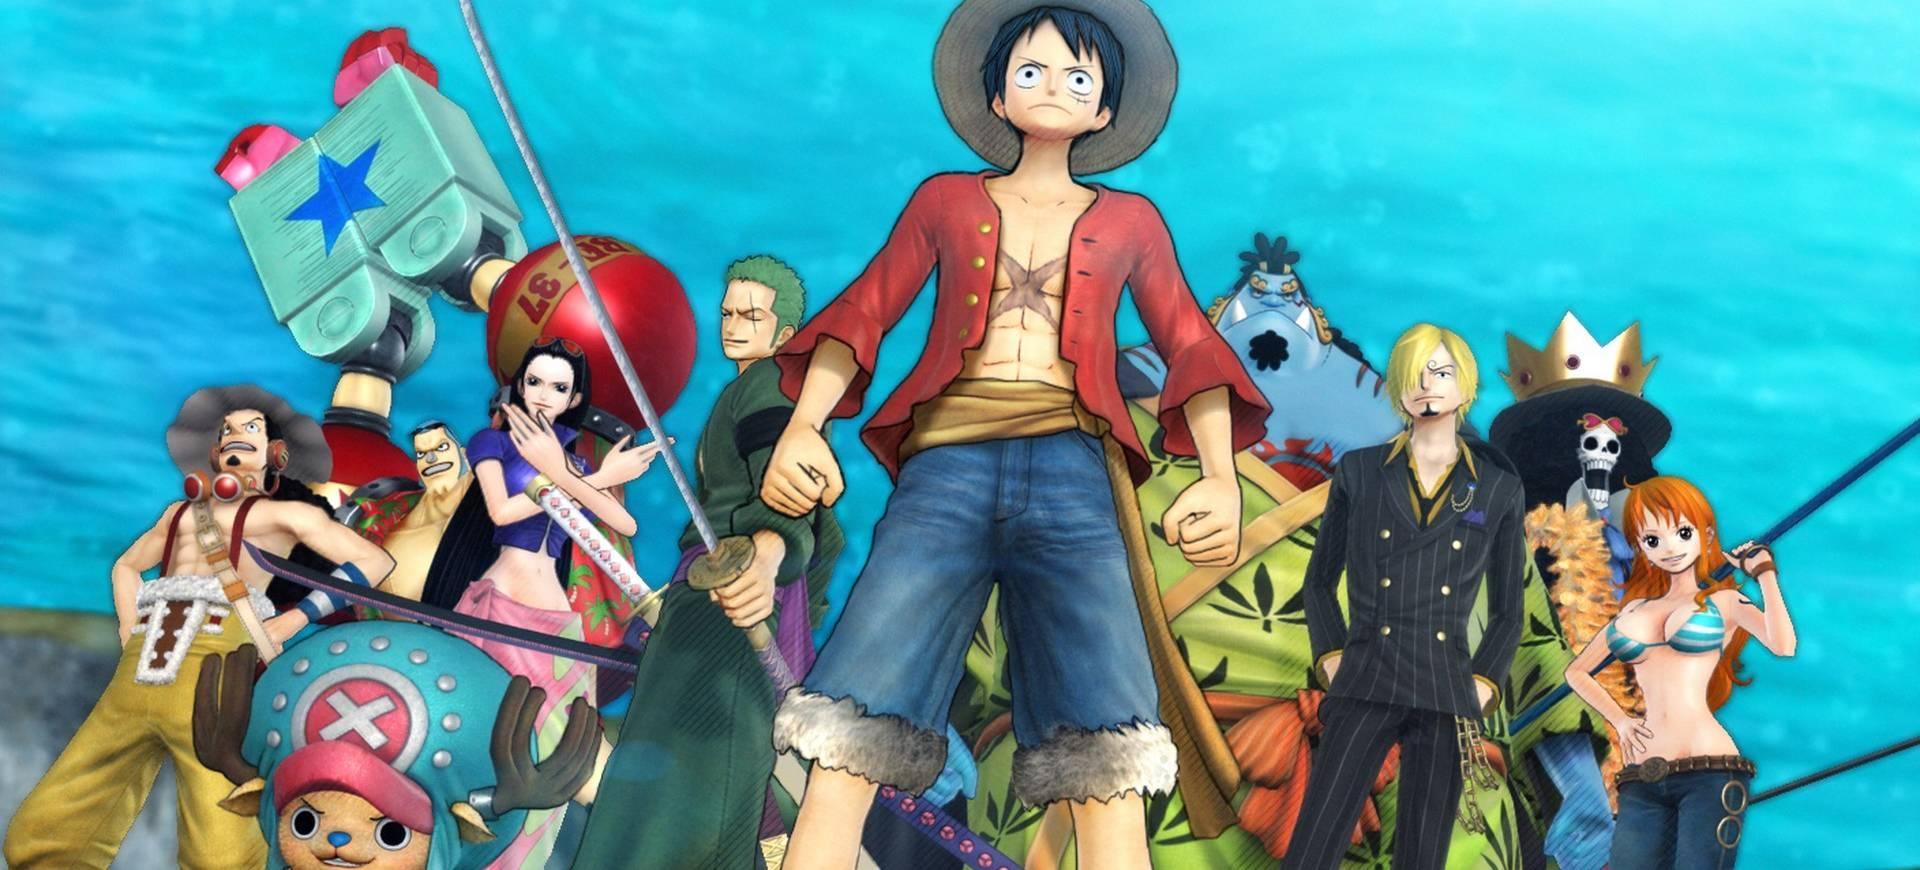 One Piece Pirate Warriors 3 - Đánh Giá Game